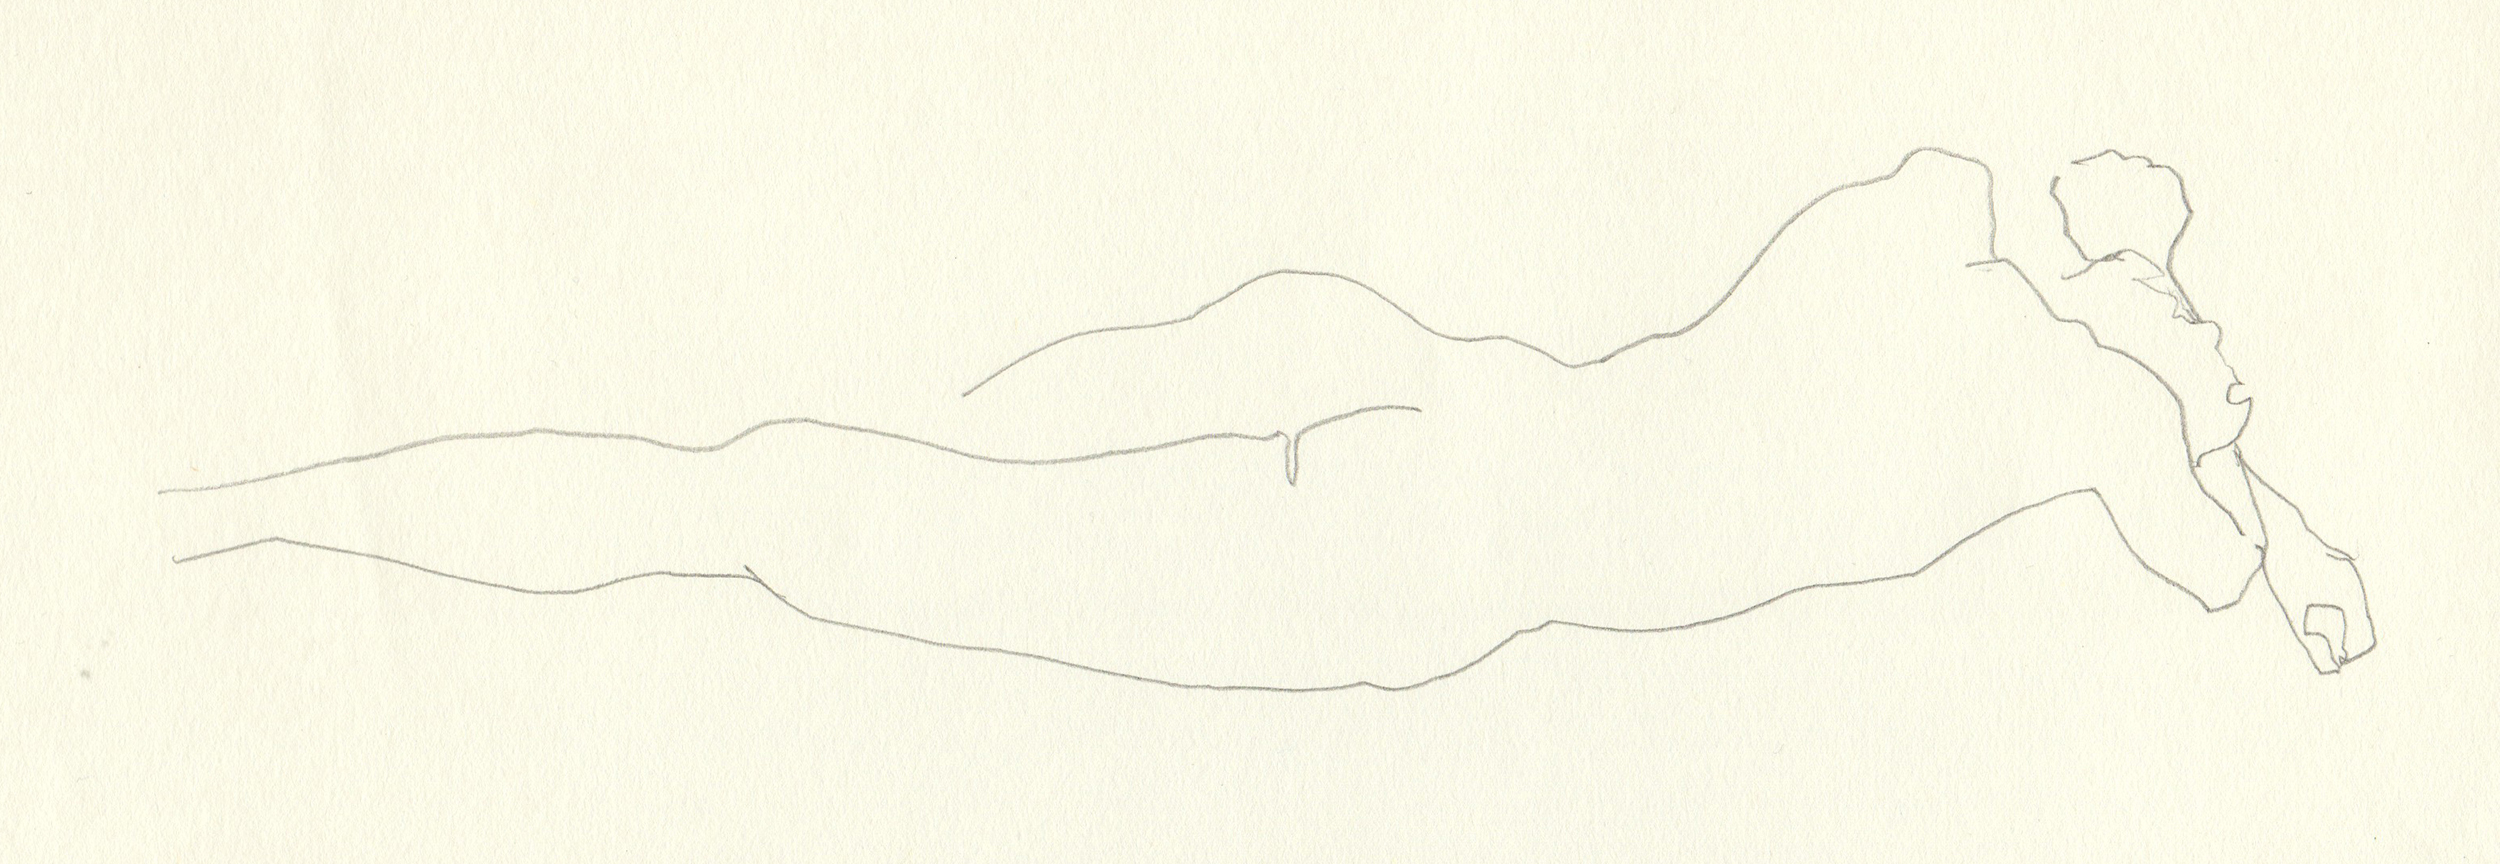 2012_Sketch_F-Beudin_078